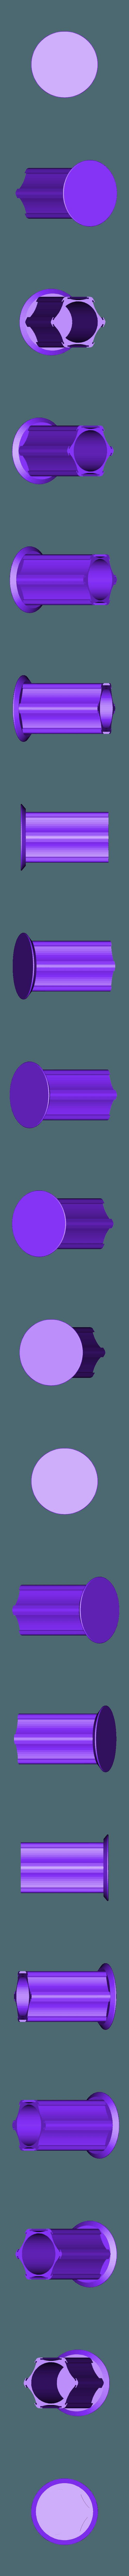 completeruben.stl Download free STL file Nespresso Capsule Tower • 3D printing template, rubenzilzer